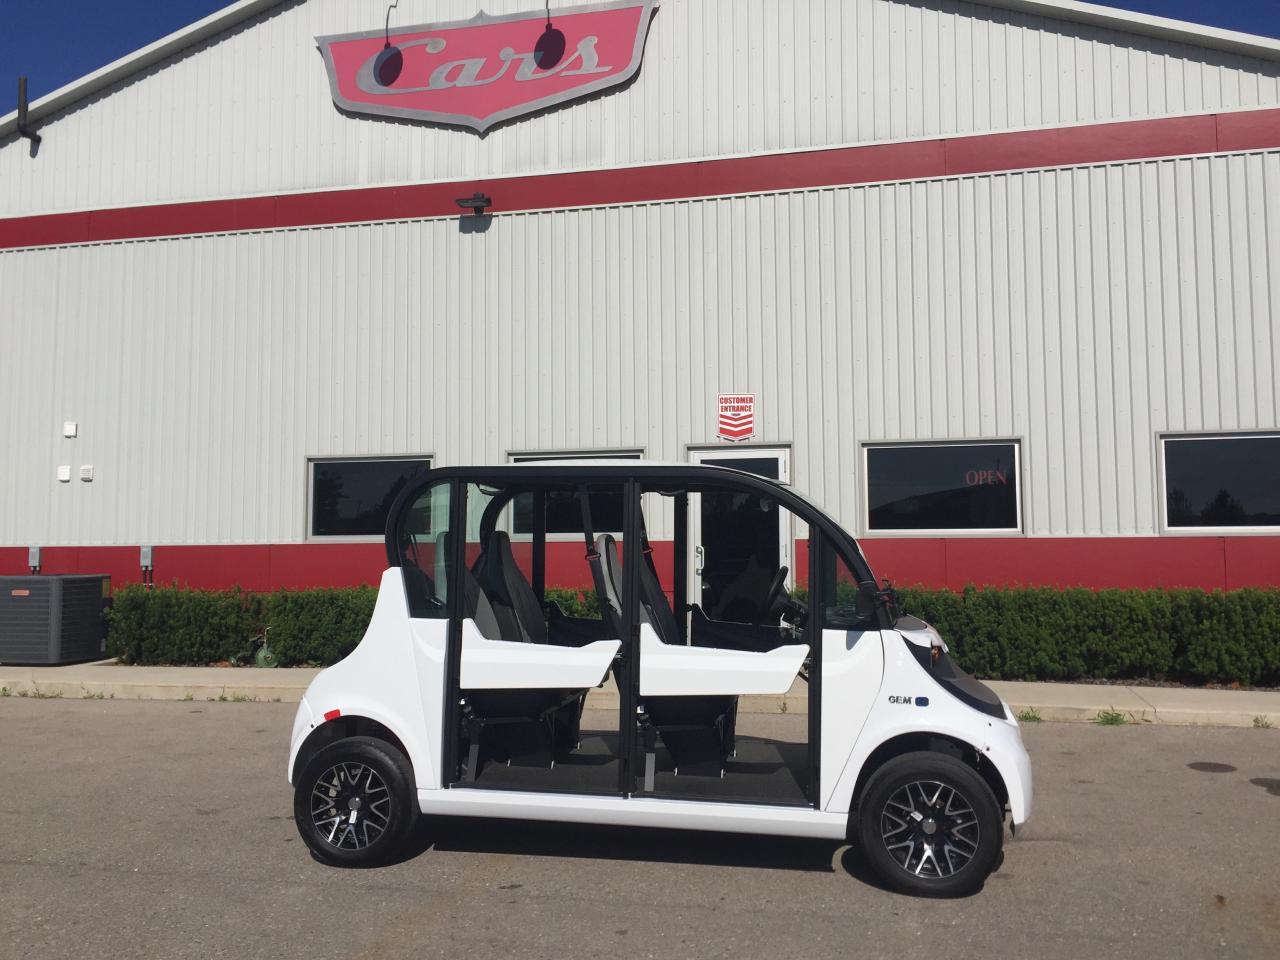 2018 GEM E825 e4 Low Speed Vehicle